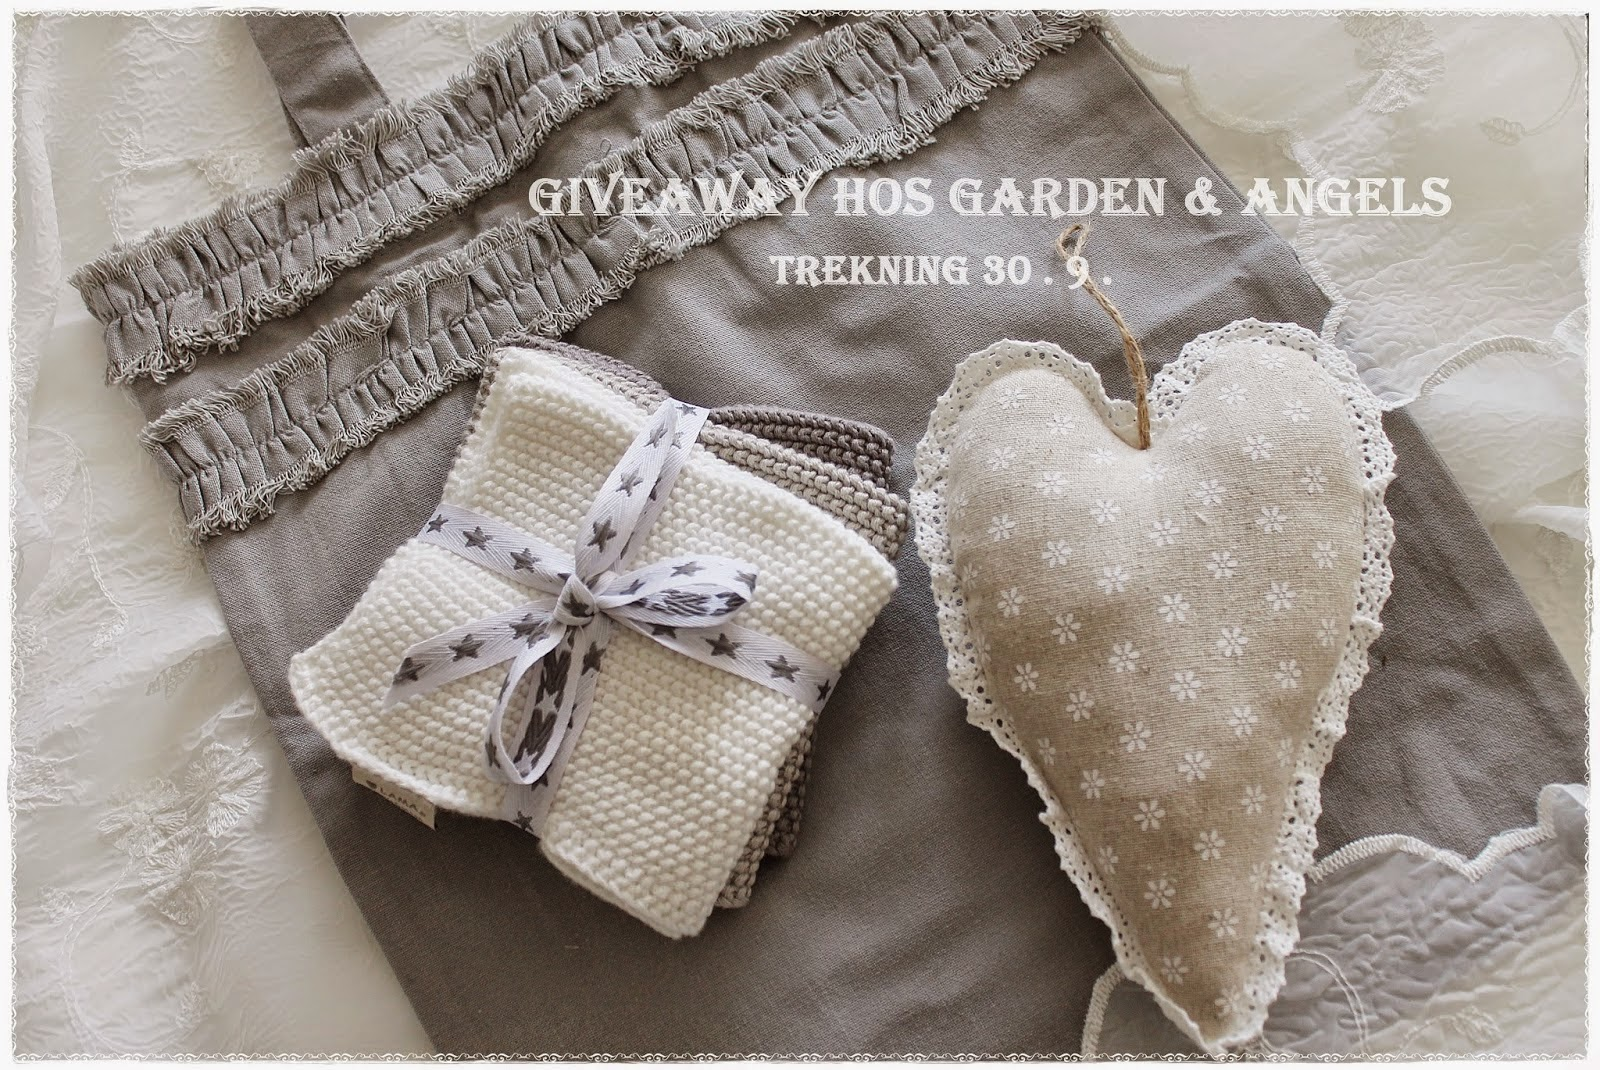 Garden&angels